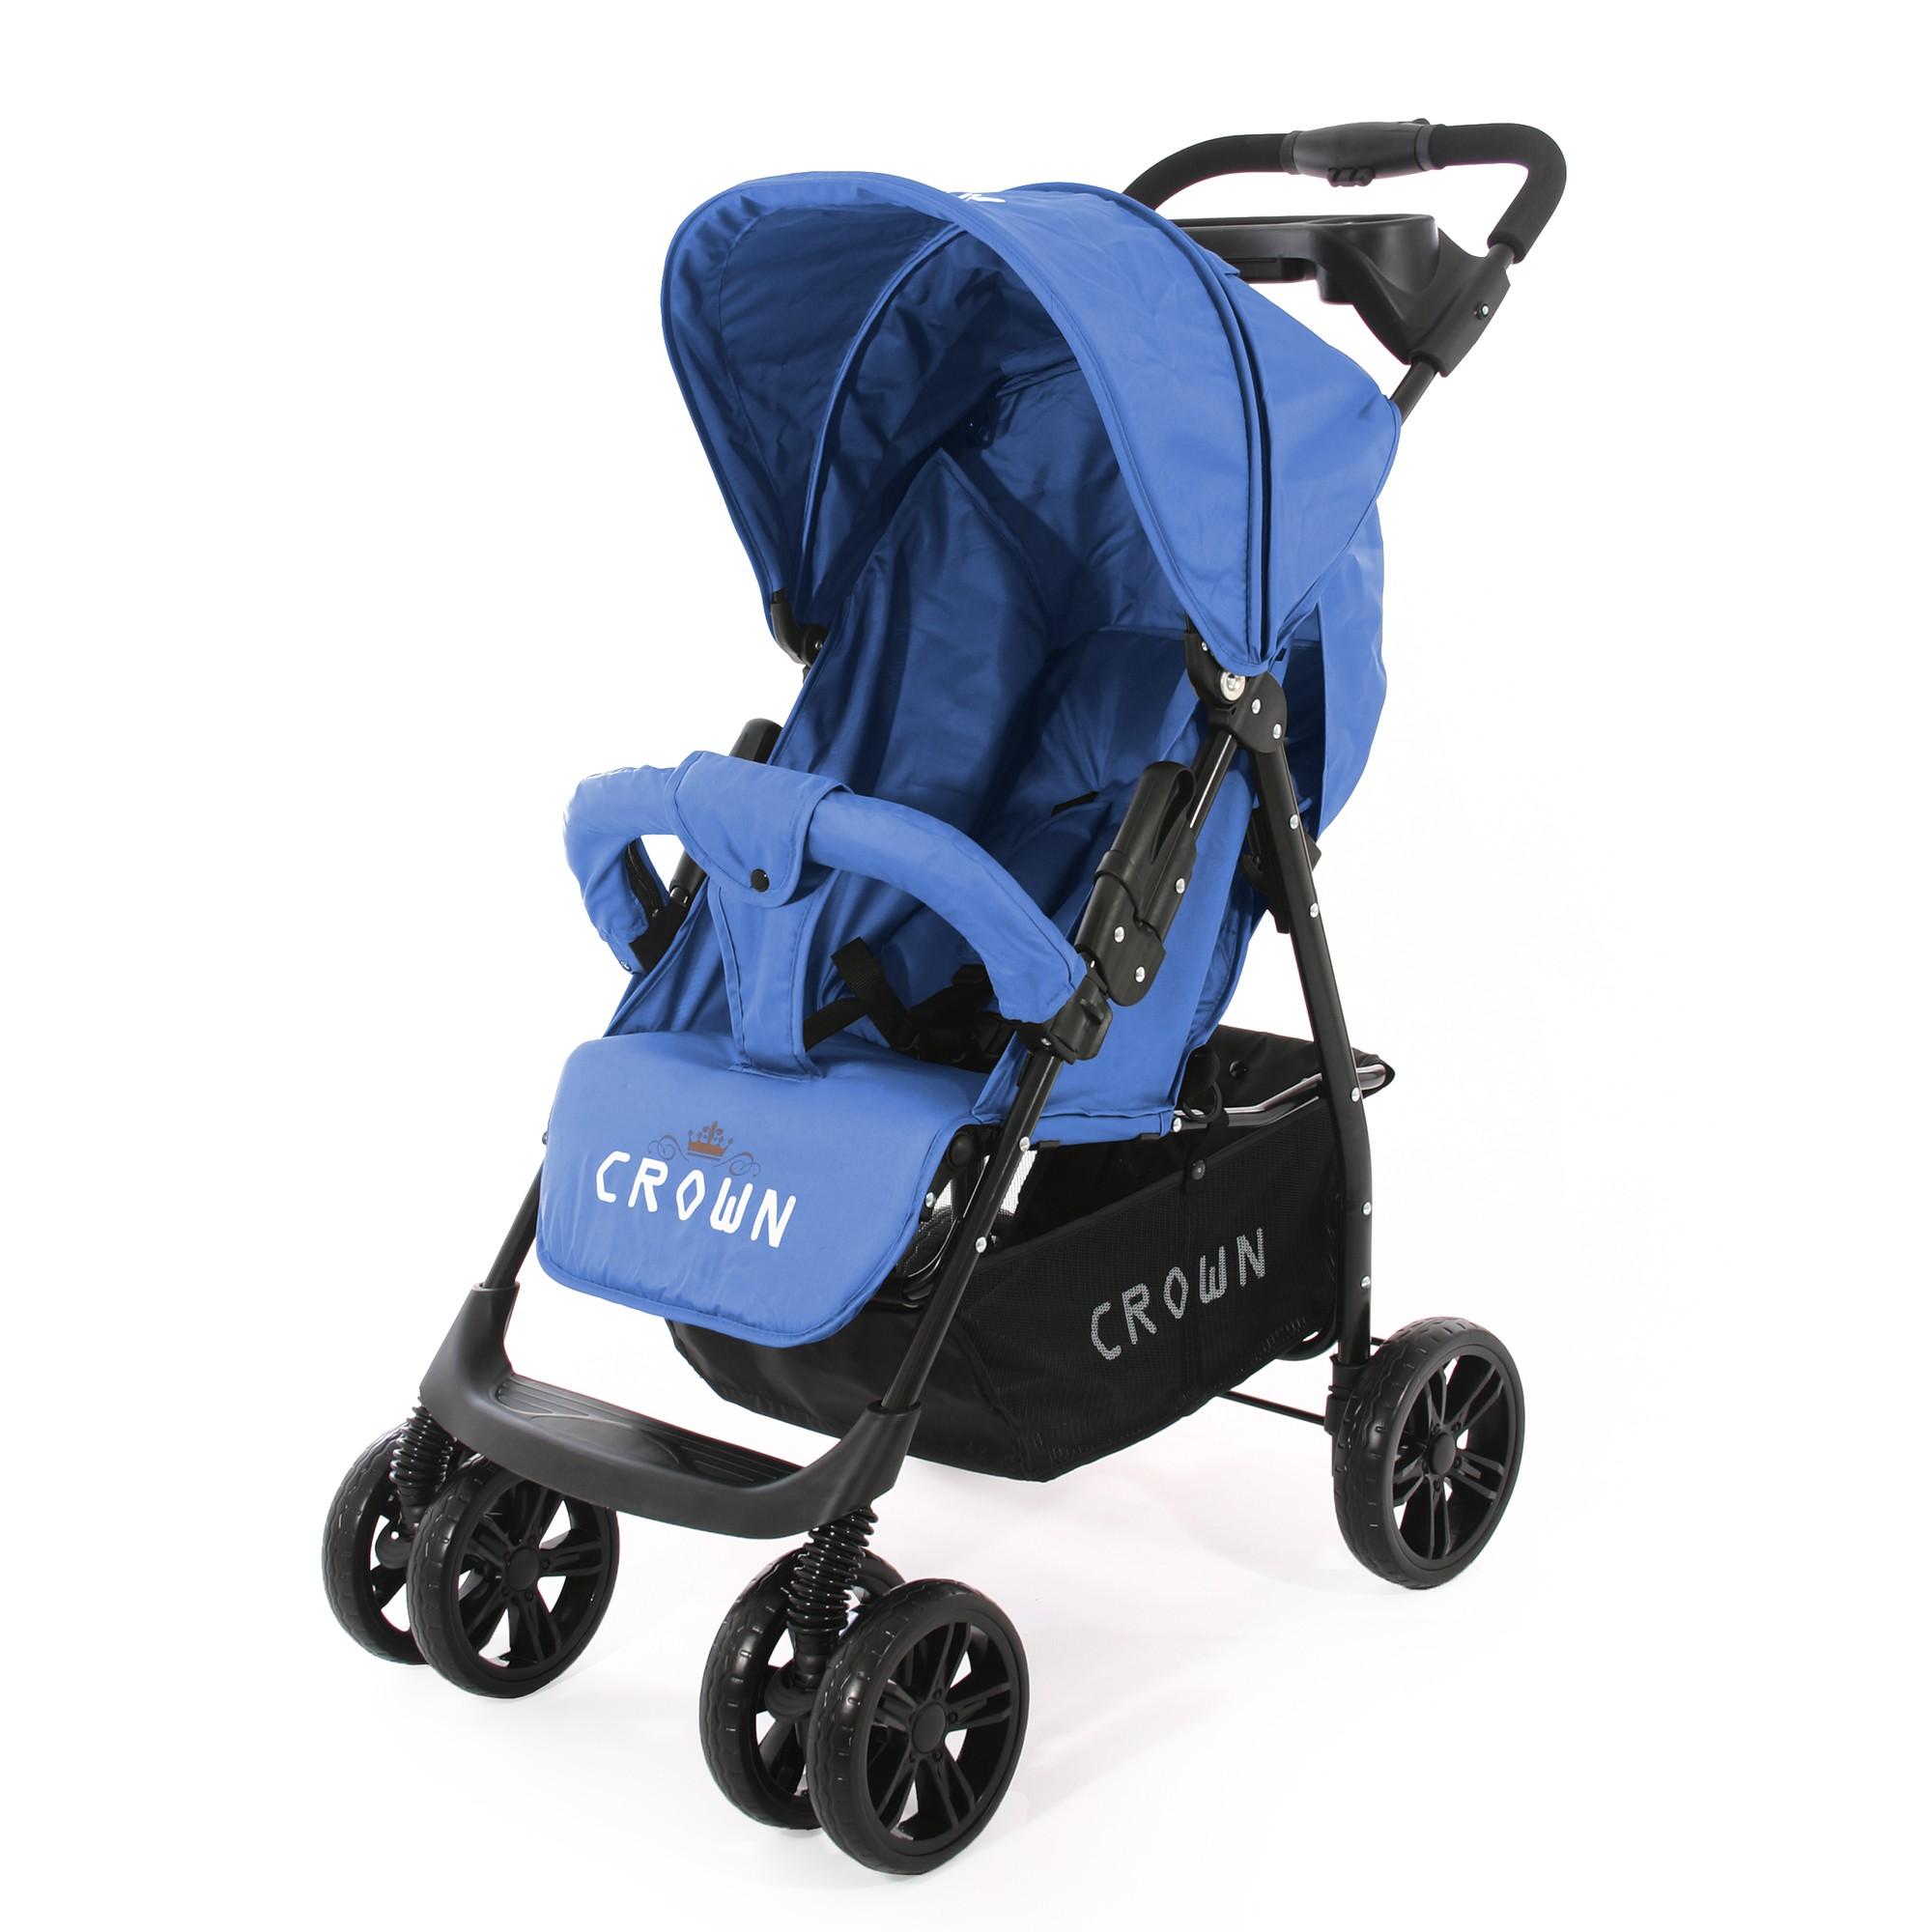 crown st570 kinderwagen sport buggy blau kinderwagen buggy. Black Bedroom Furniture Sets. Home Design Ideas